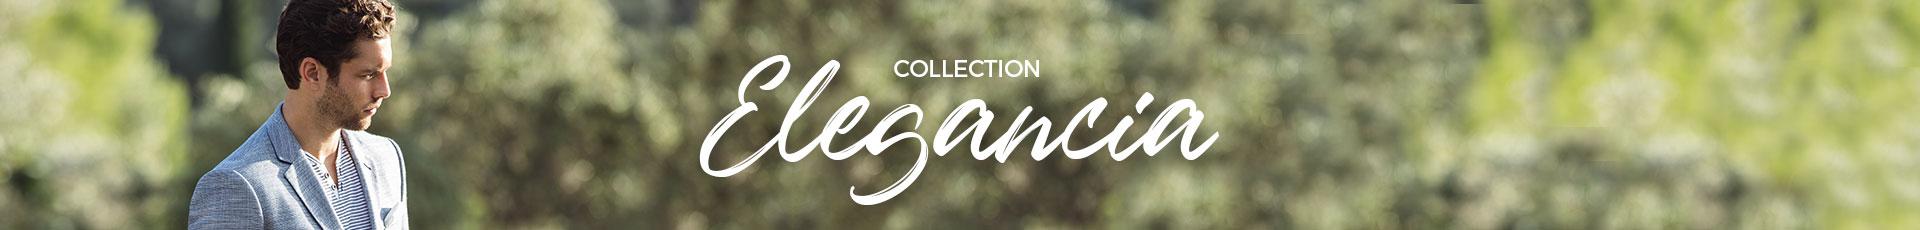 Collection Elegancia